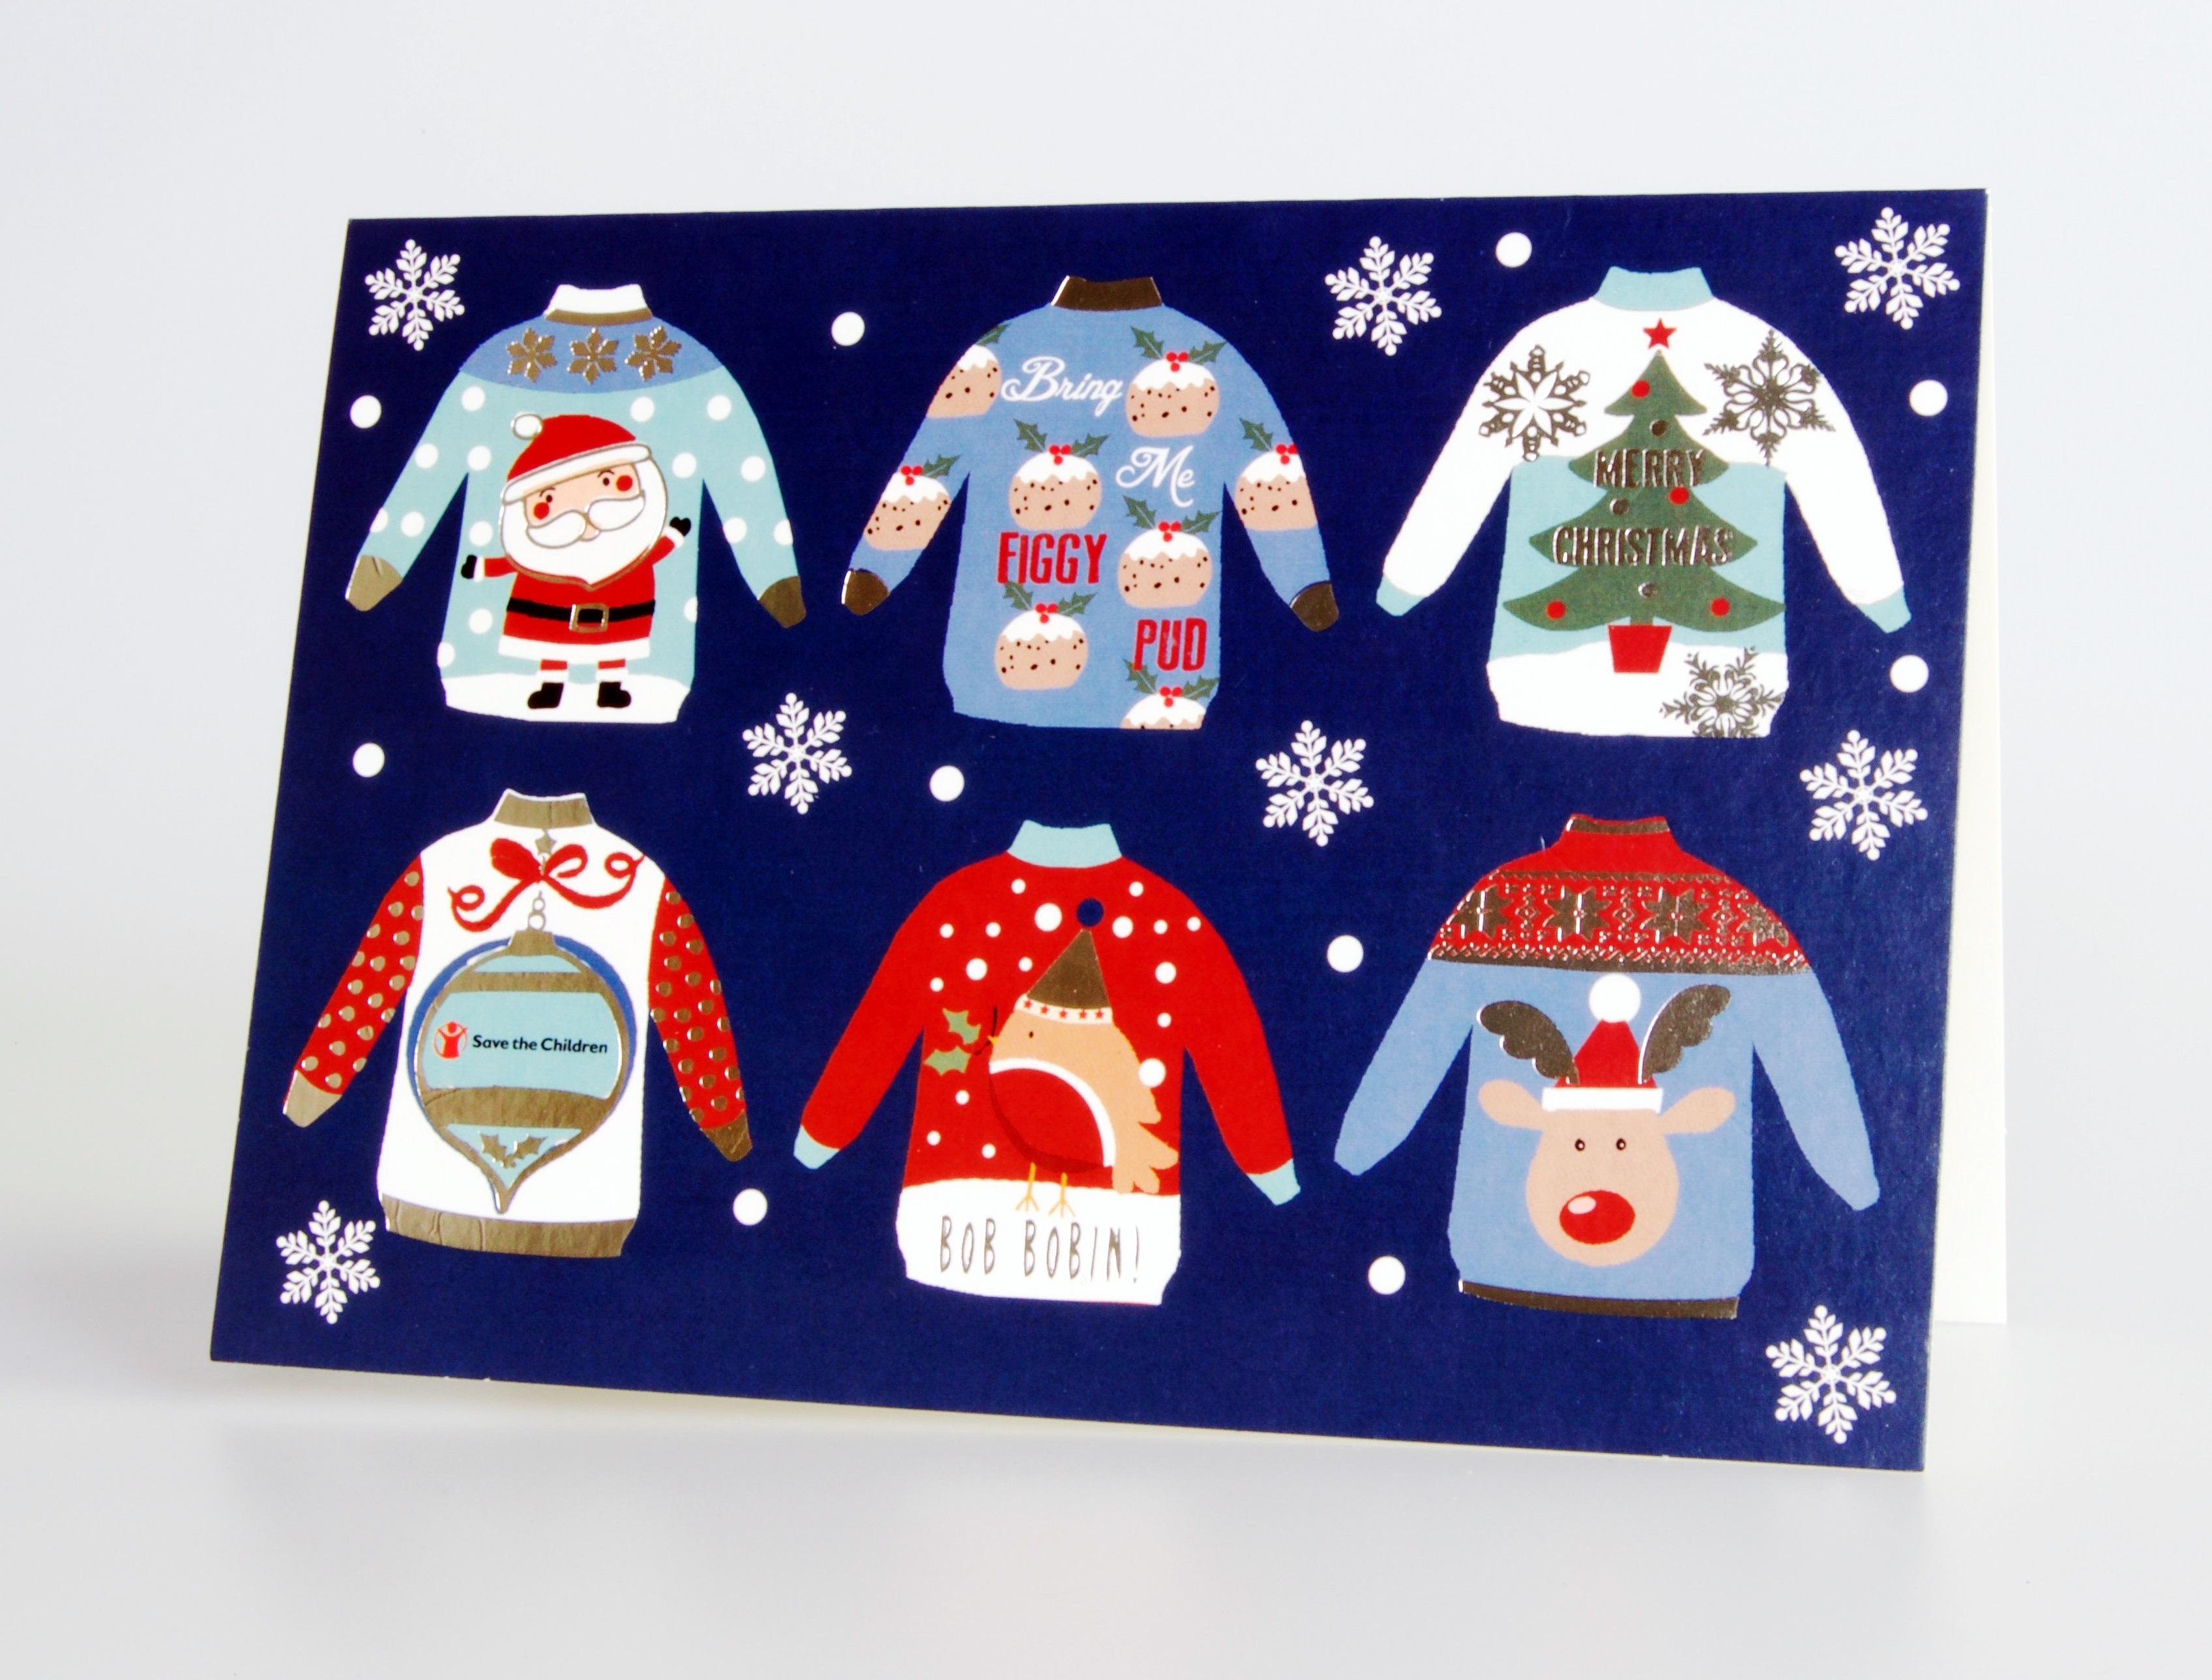 Christmas Jumper | Save the Children Shop